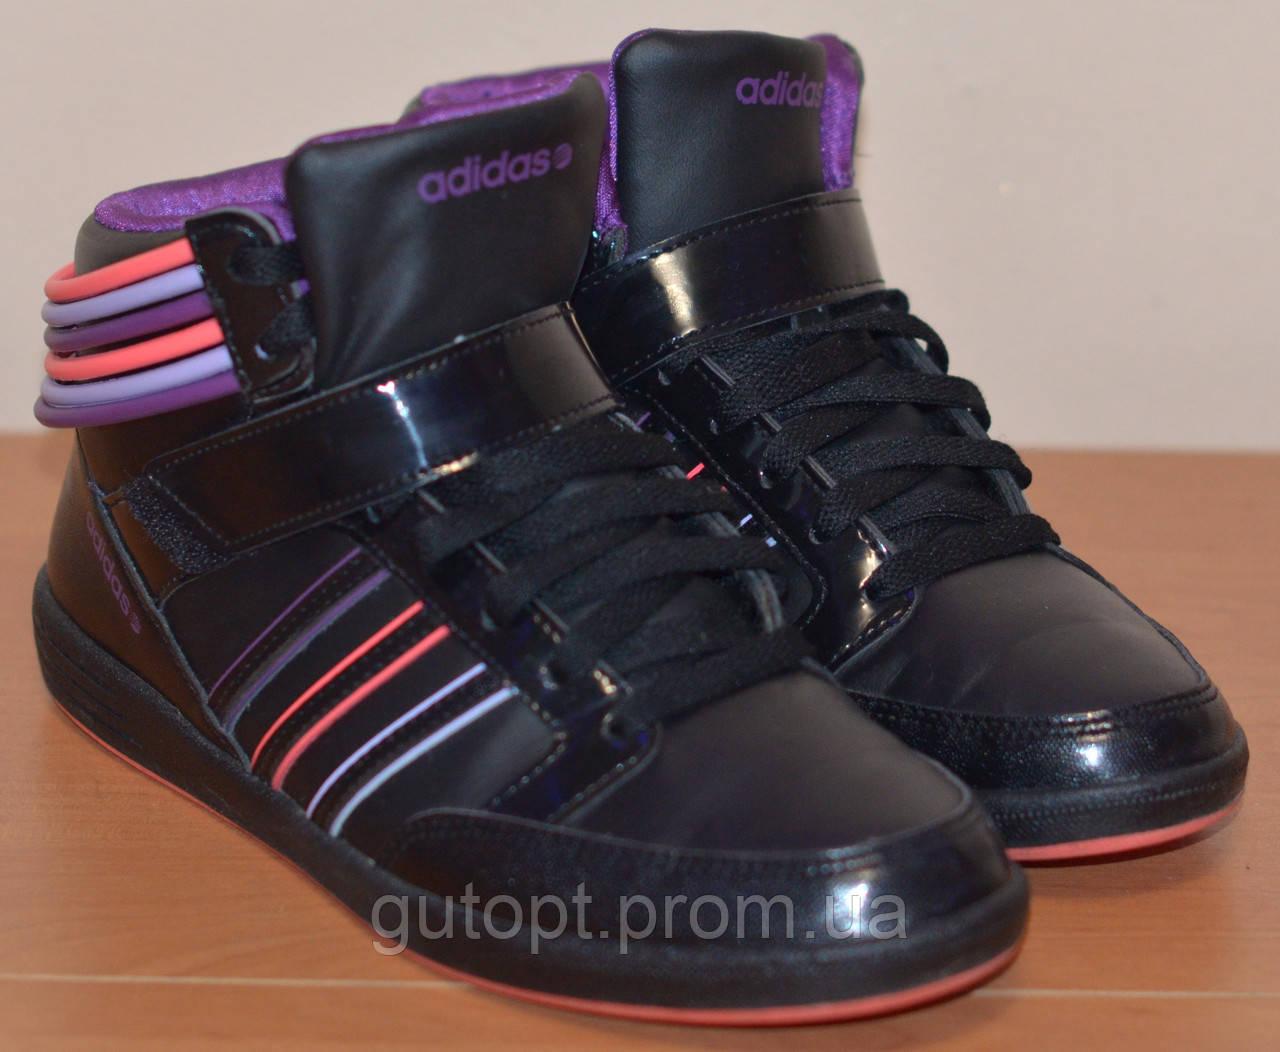 Кросівки оригинал Adidas б у из Германии  1 240 грн. - Спортивная ... f8f5ec257bc